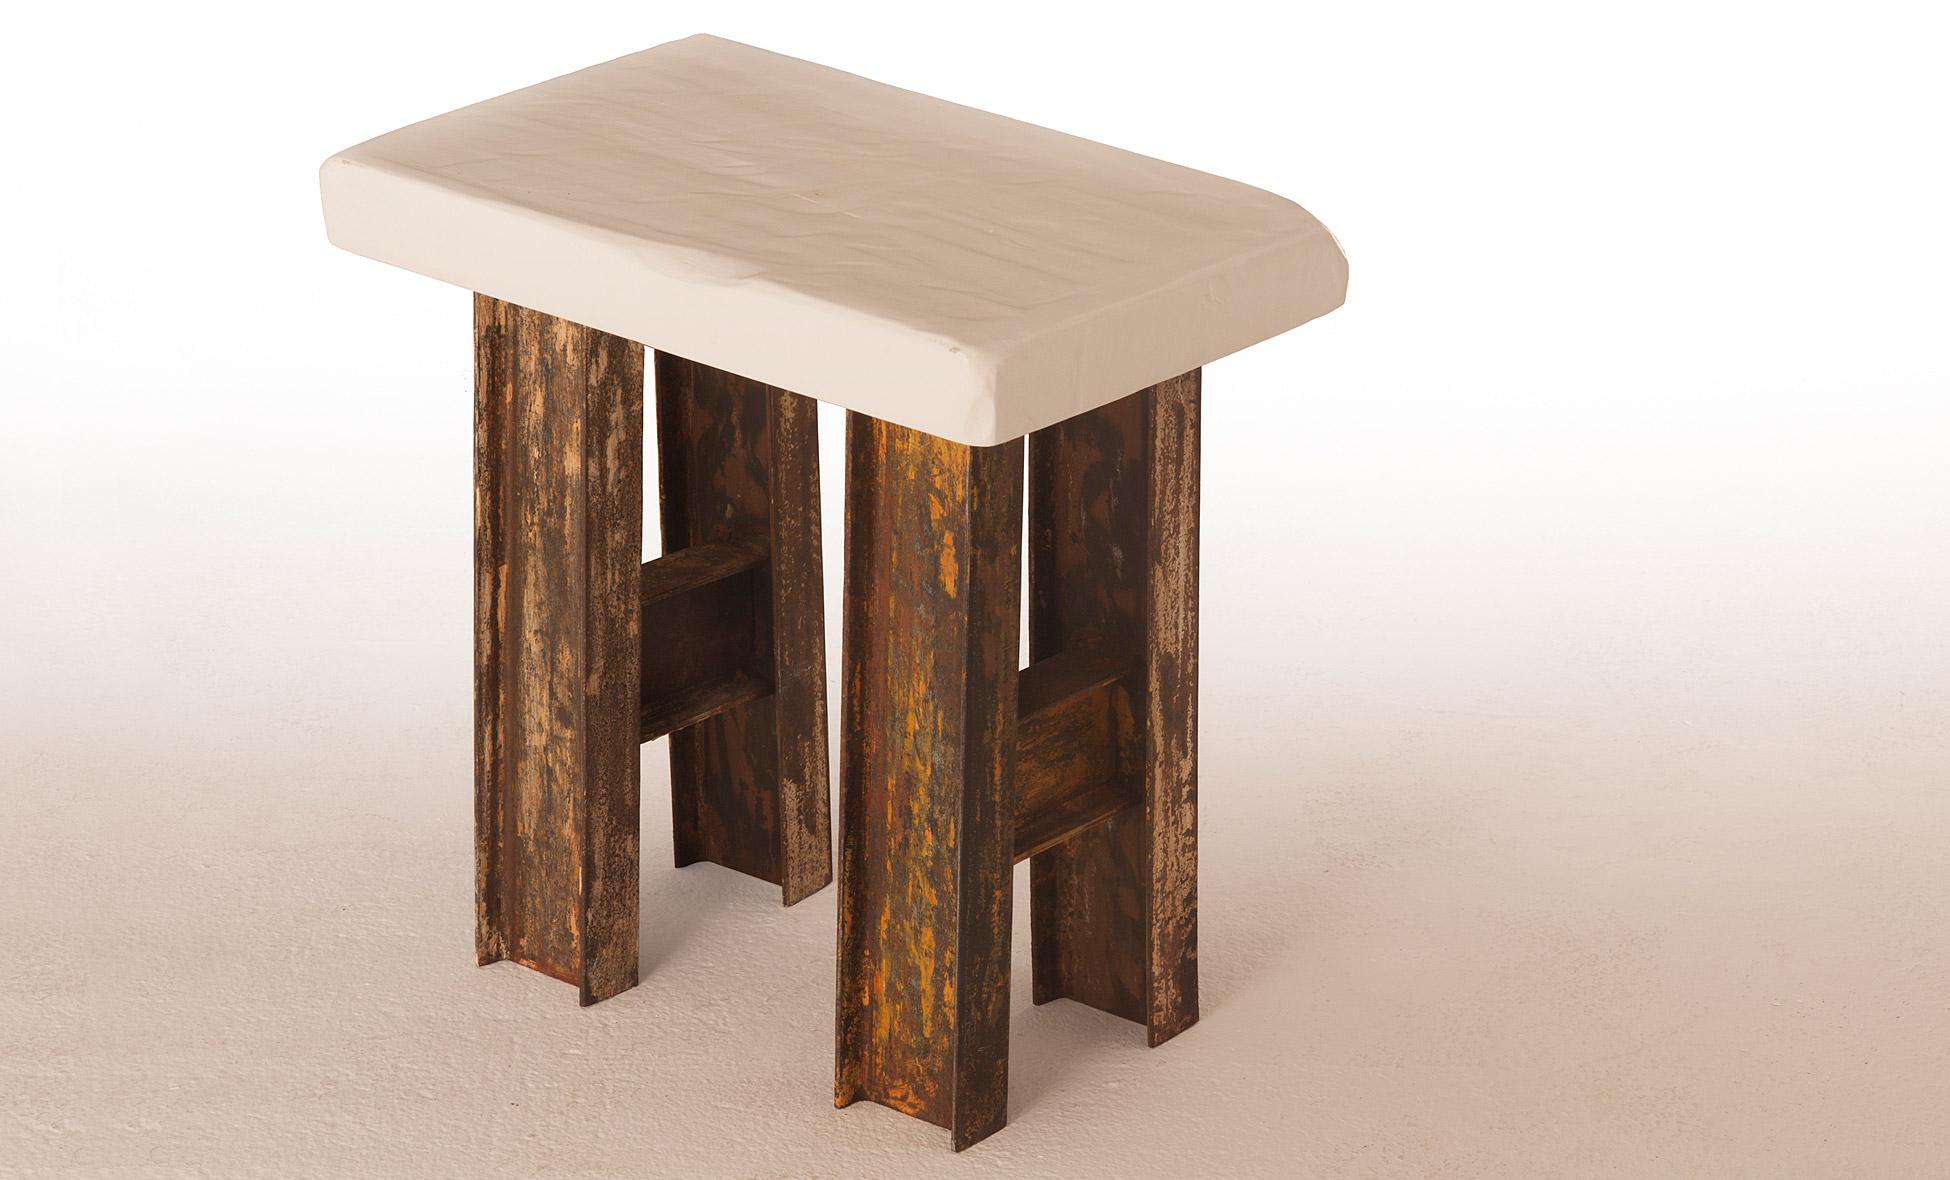 Muebles de cocina en bilbao excellent amazing cool for Muebles baratos bilbao